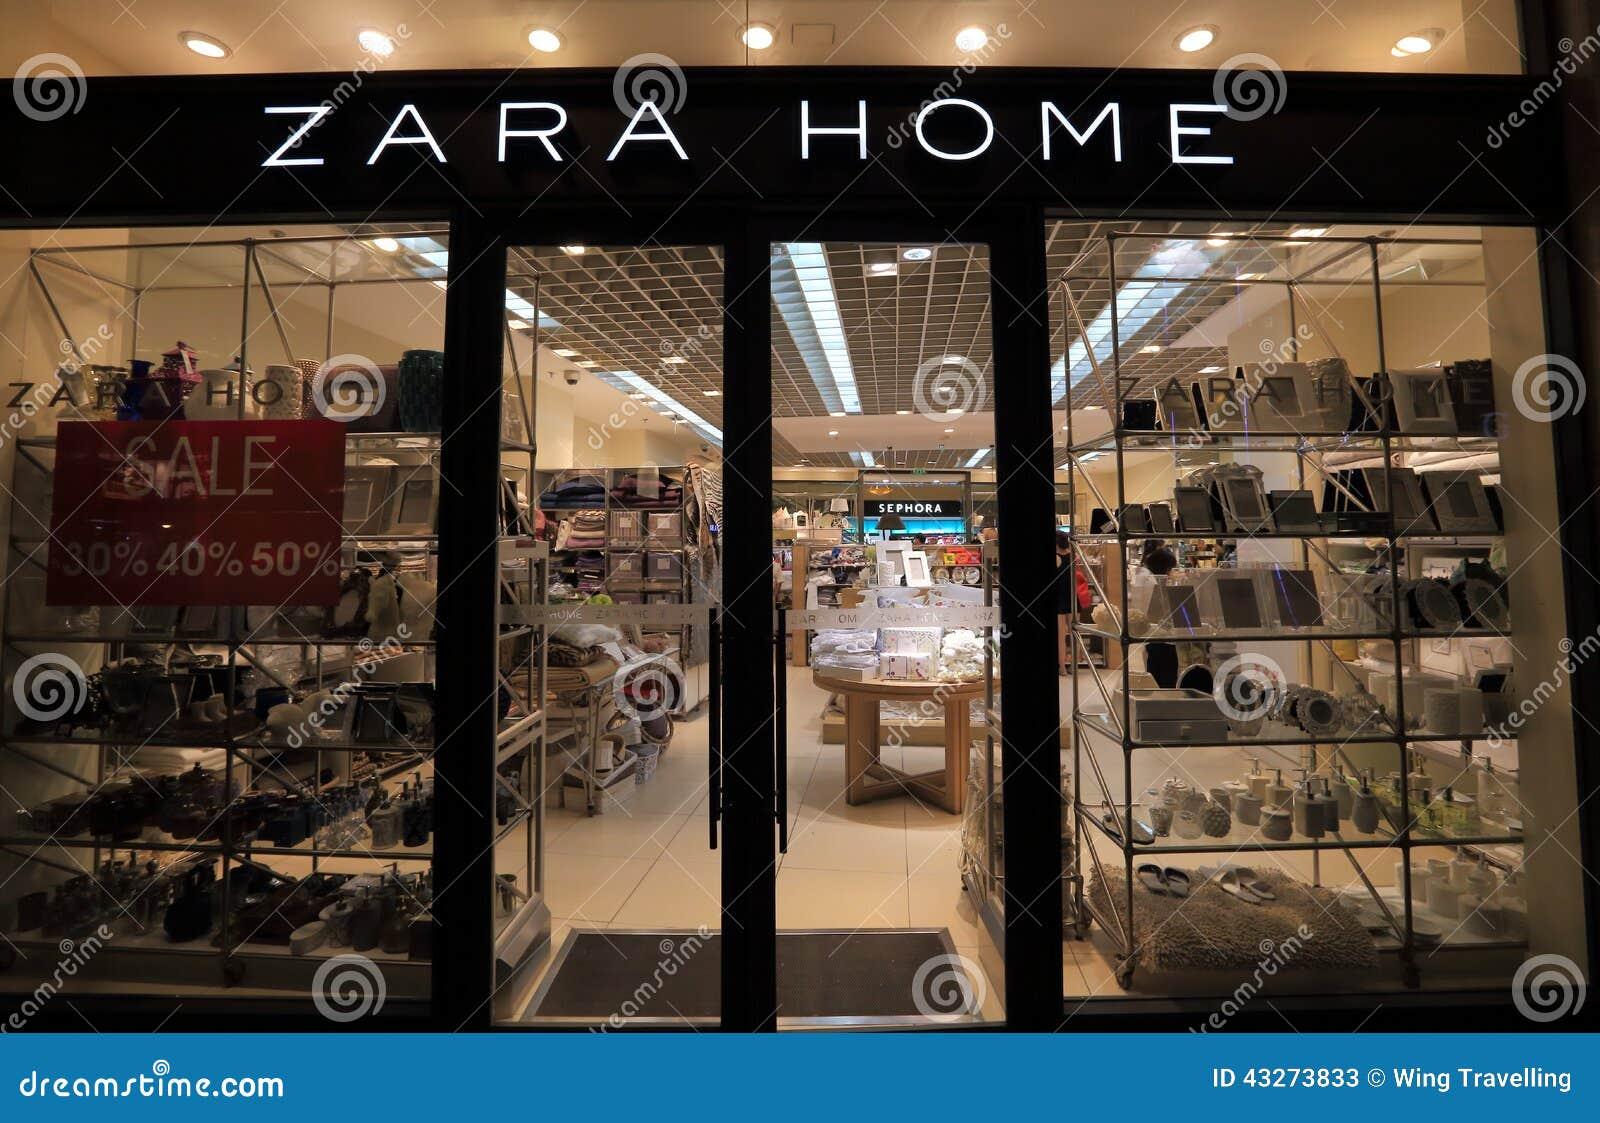 Zara home to open in toronto - Zara Home Online Shop Deutsch With Zara Home Shop Stock Photos Images Pictures